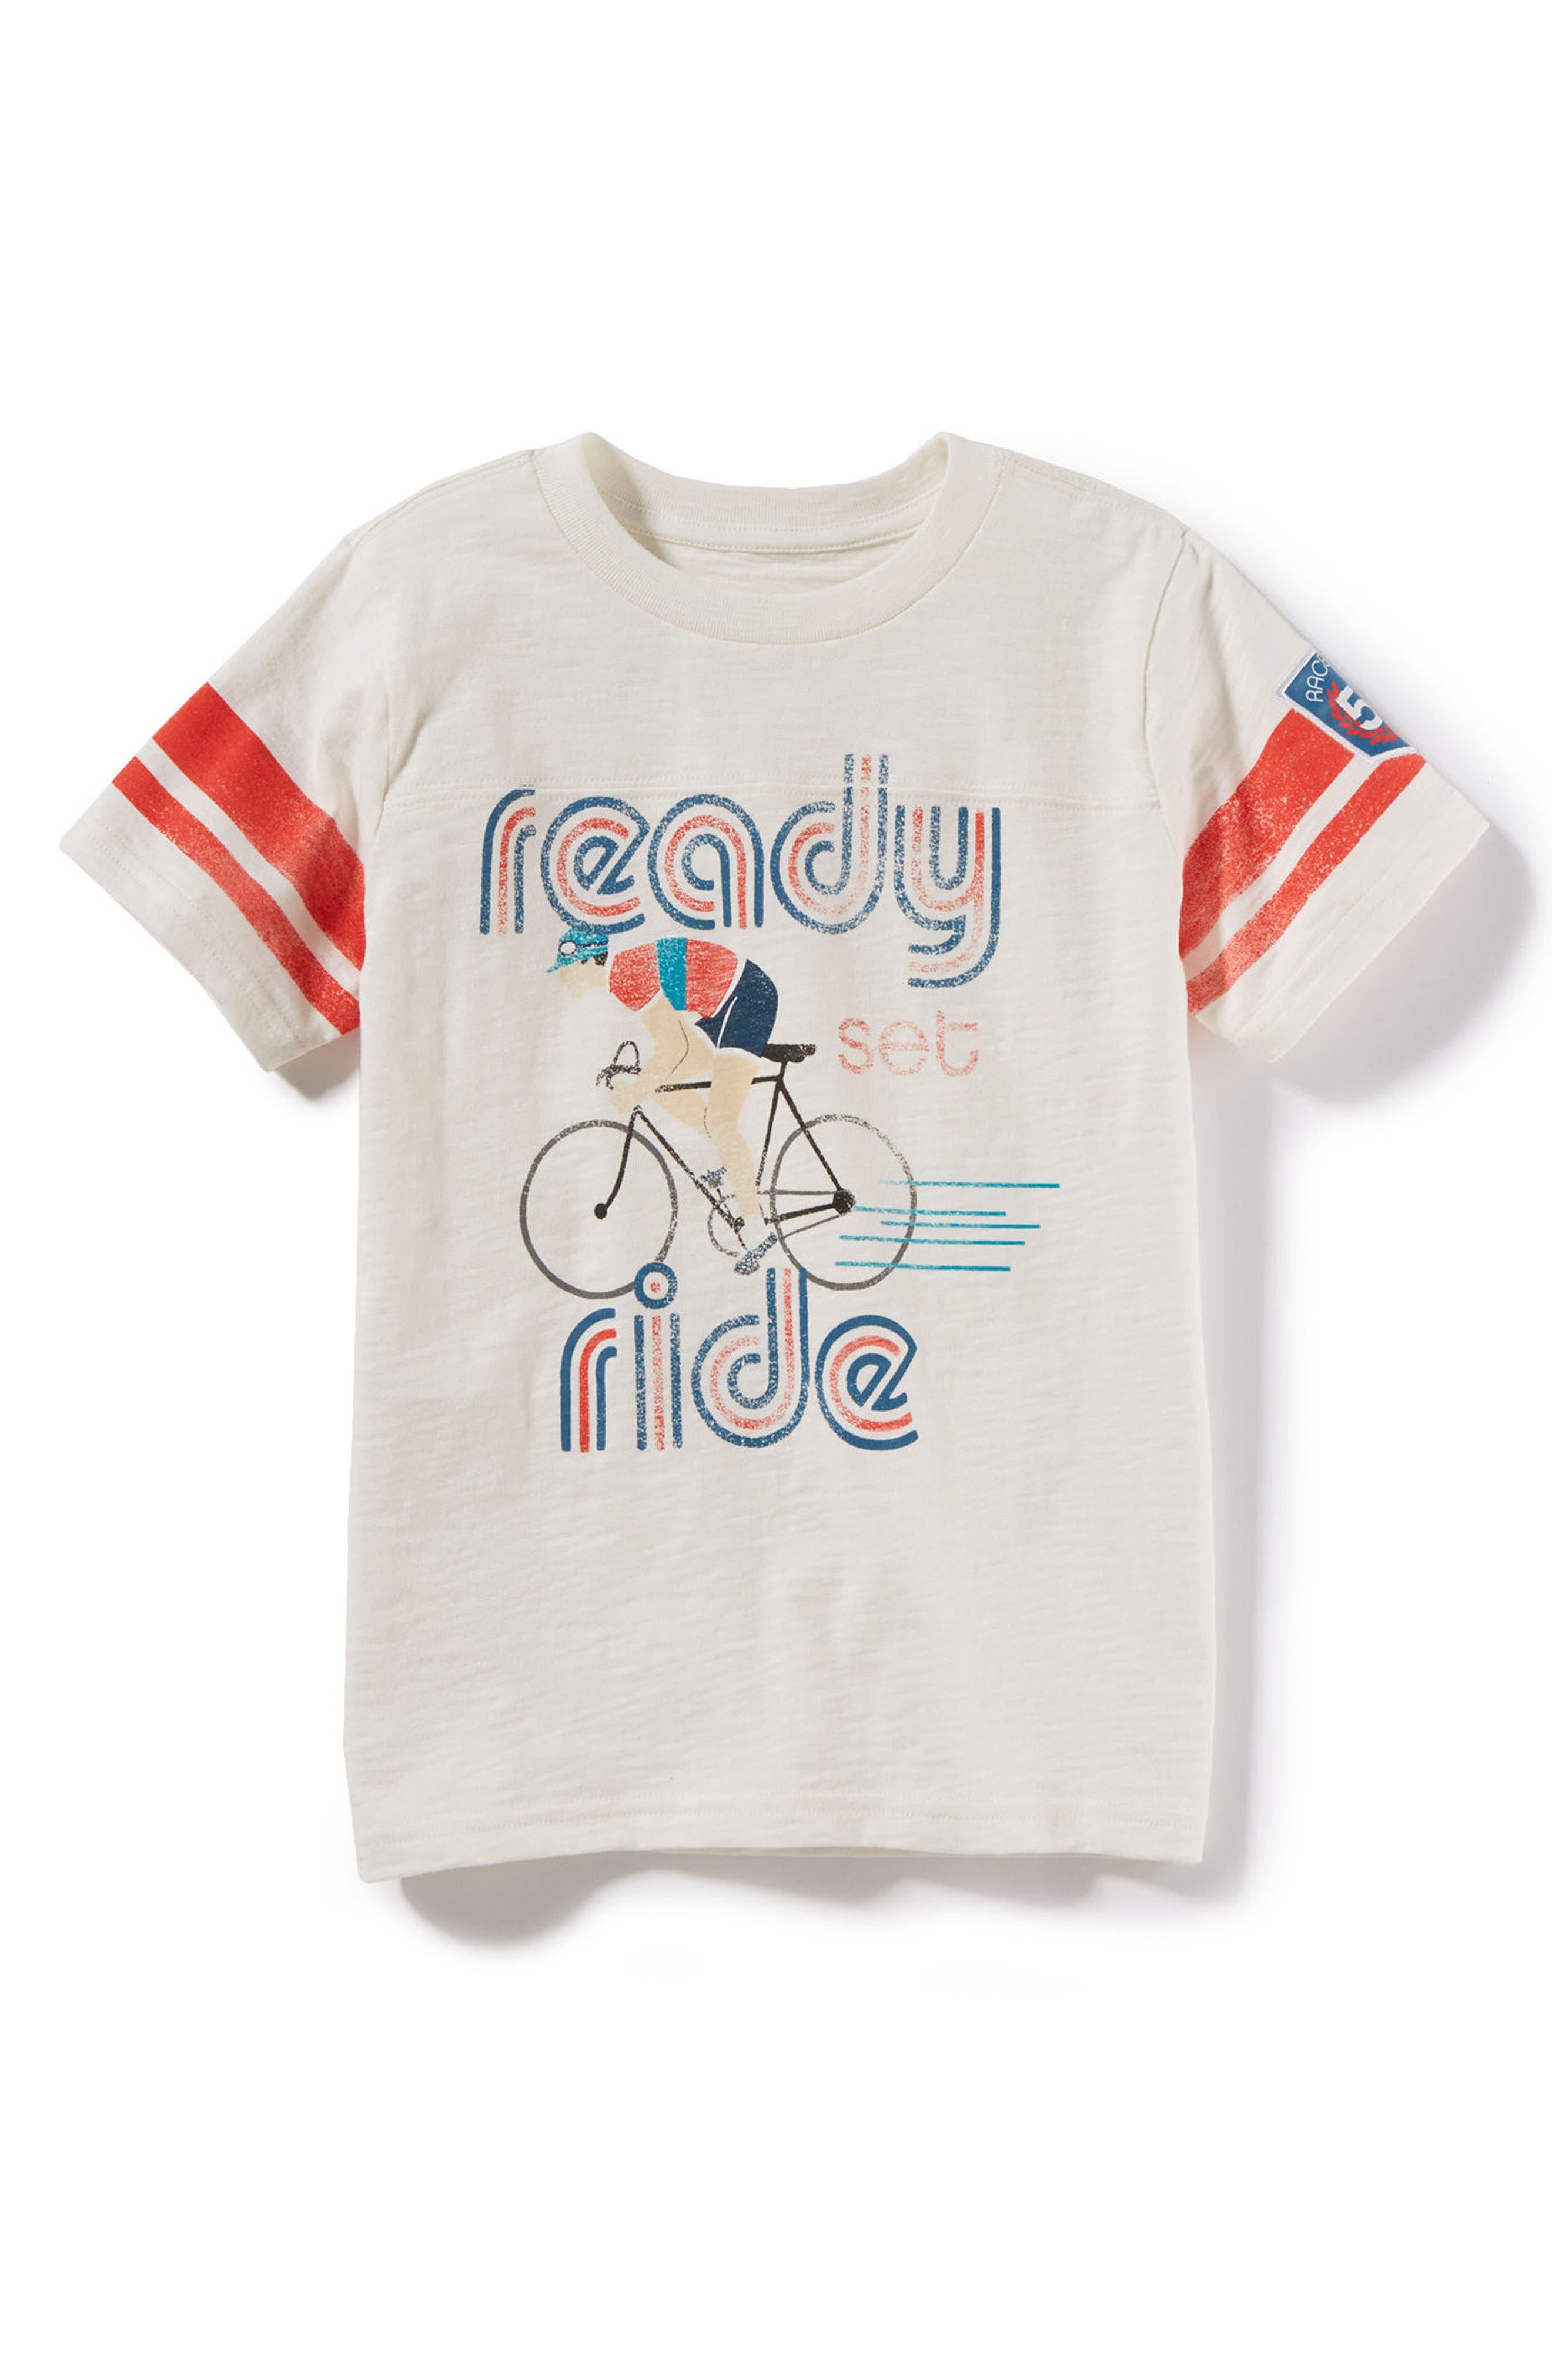 Peek Ready Set Ride Graphic T-Shirt (Toddler Boys, Little Boys & Big Boys)